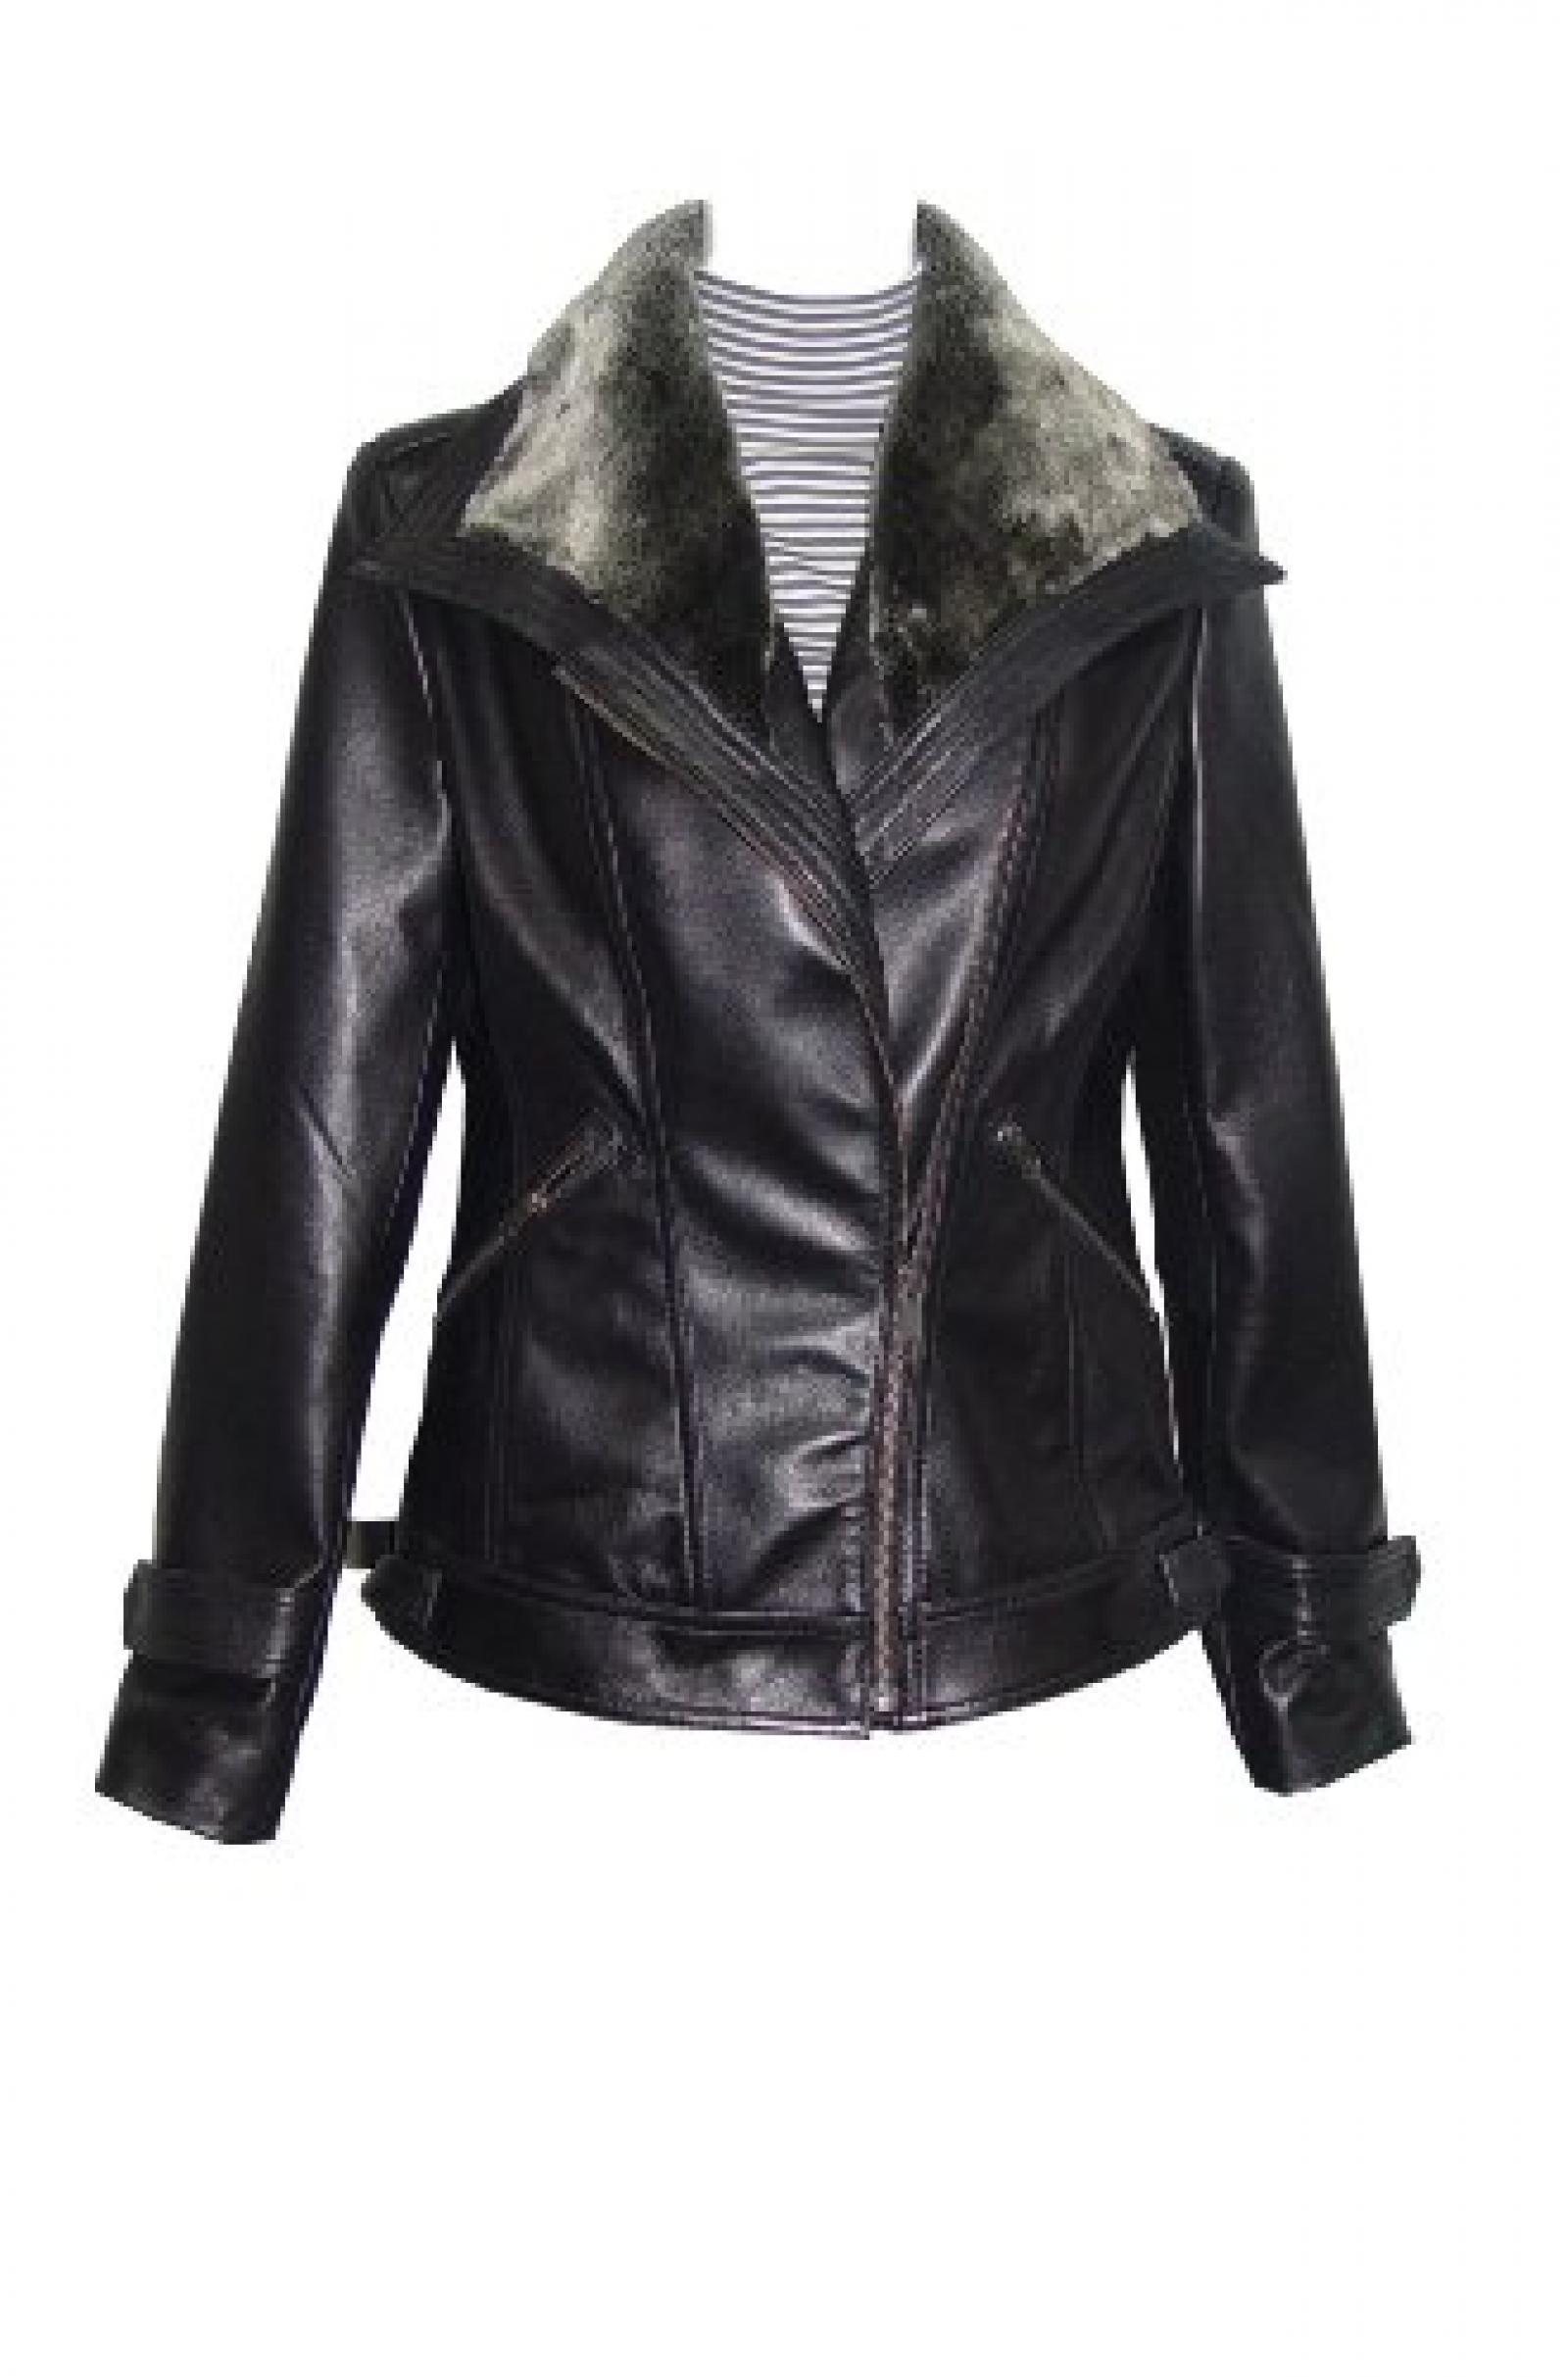 Nettailor Women PETITE SZ 4061 Lamb Leather Motorcycle Jacket Fake Fur Collar